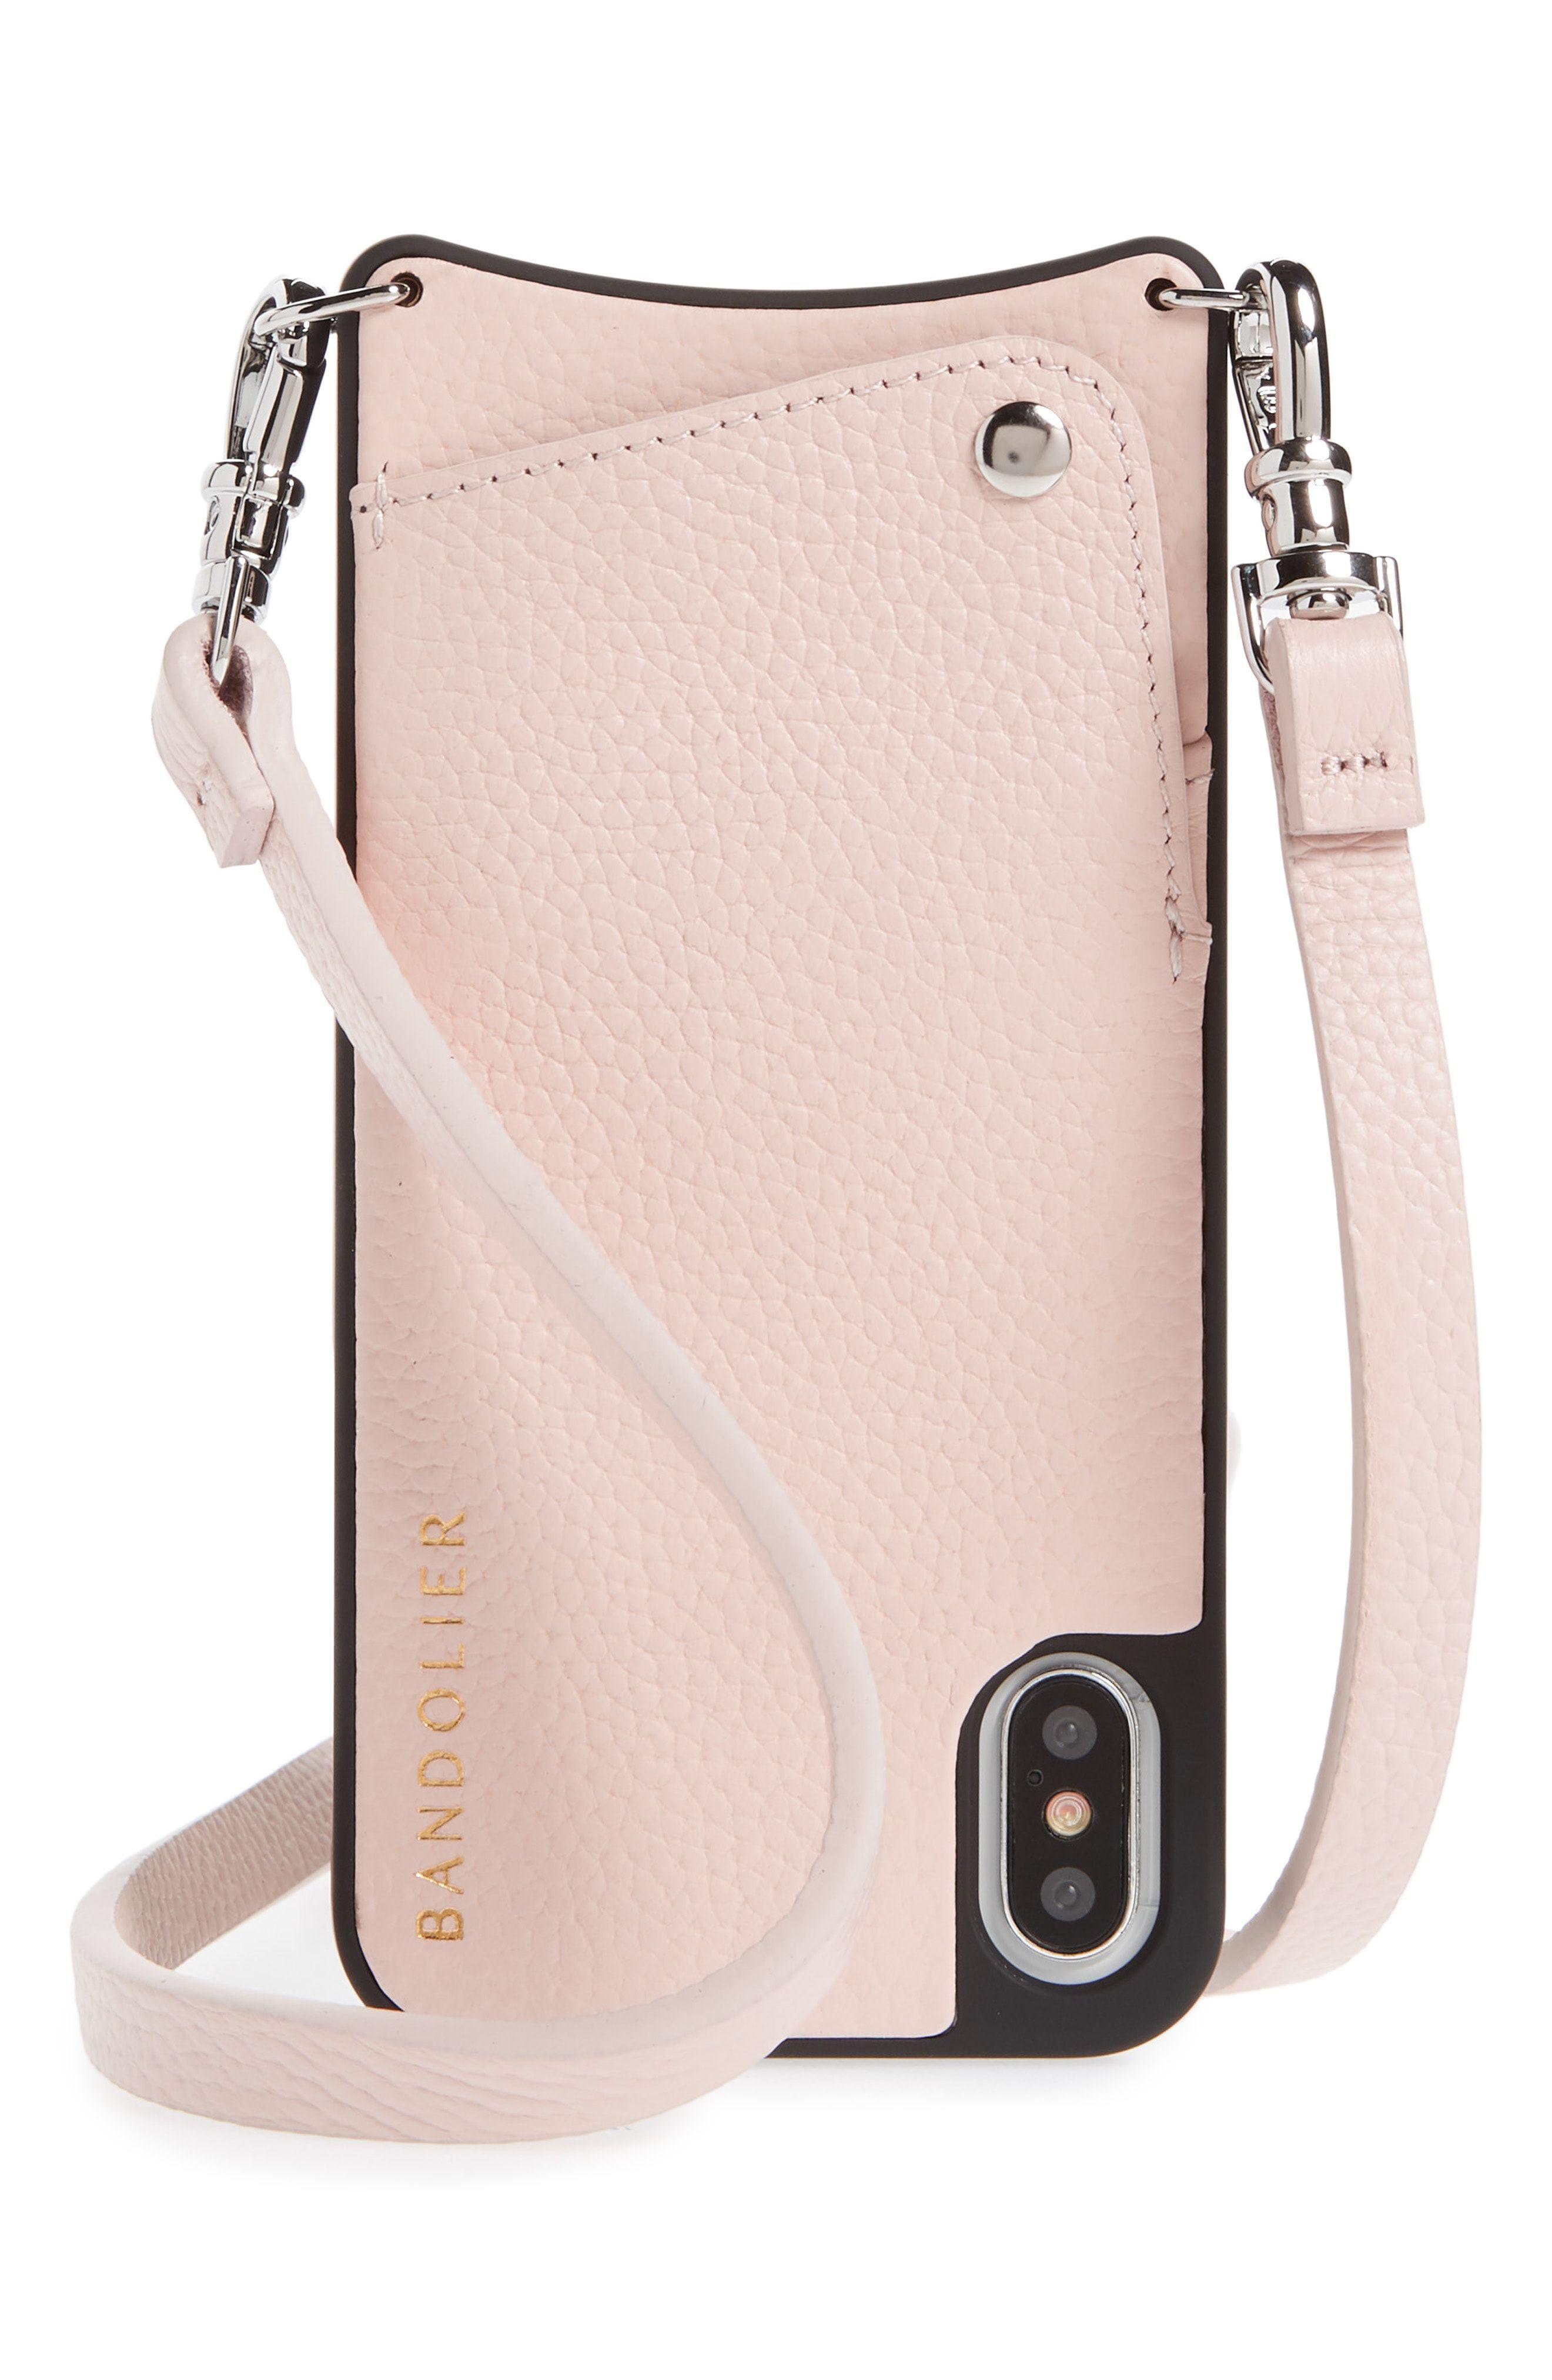 iphone crossbody bag nz